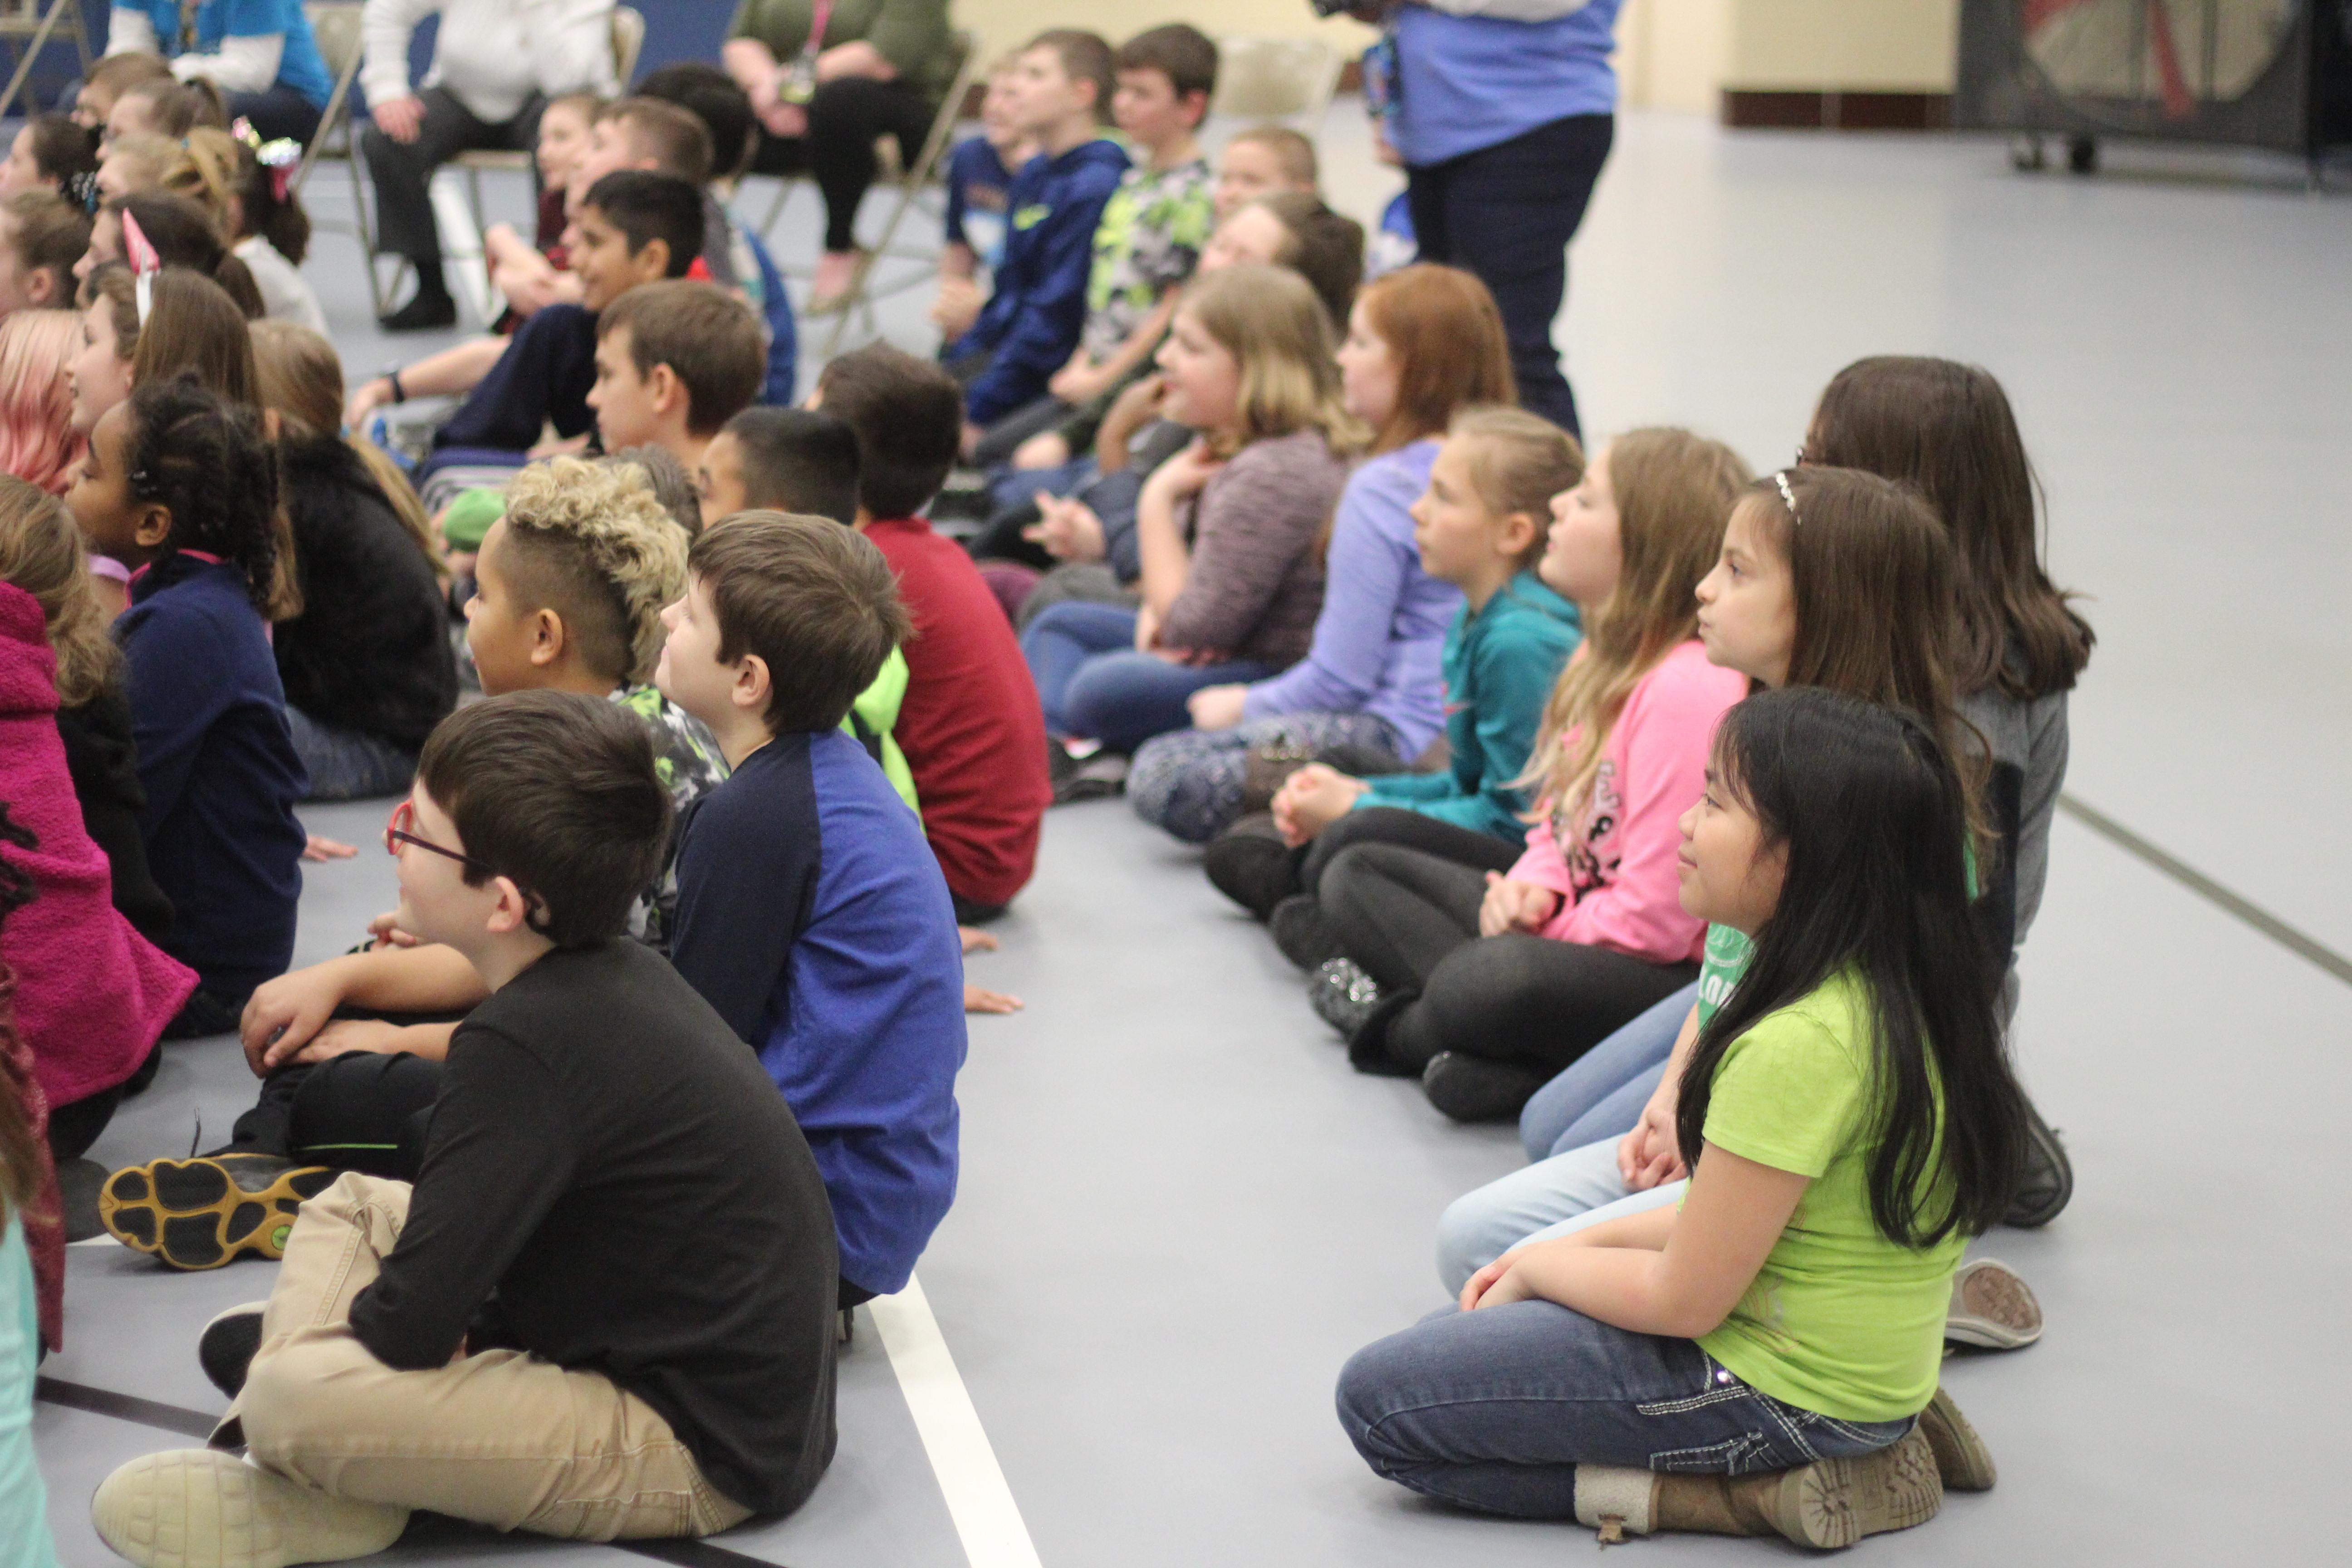 Students listen to Reynolds talk